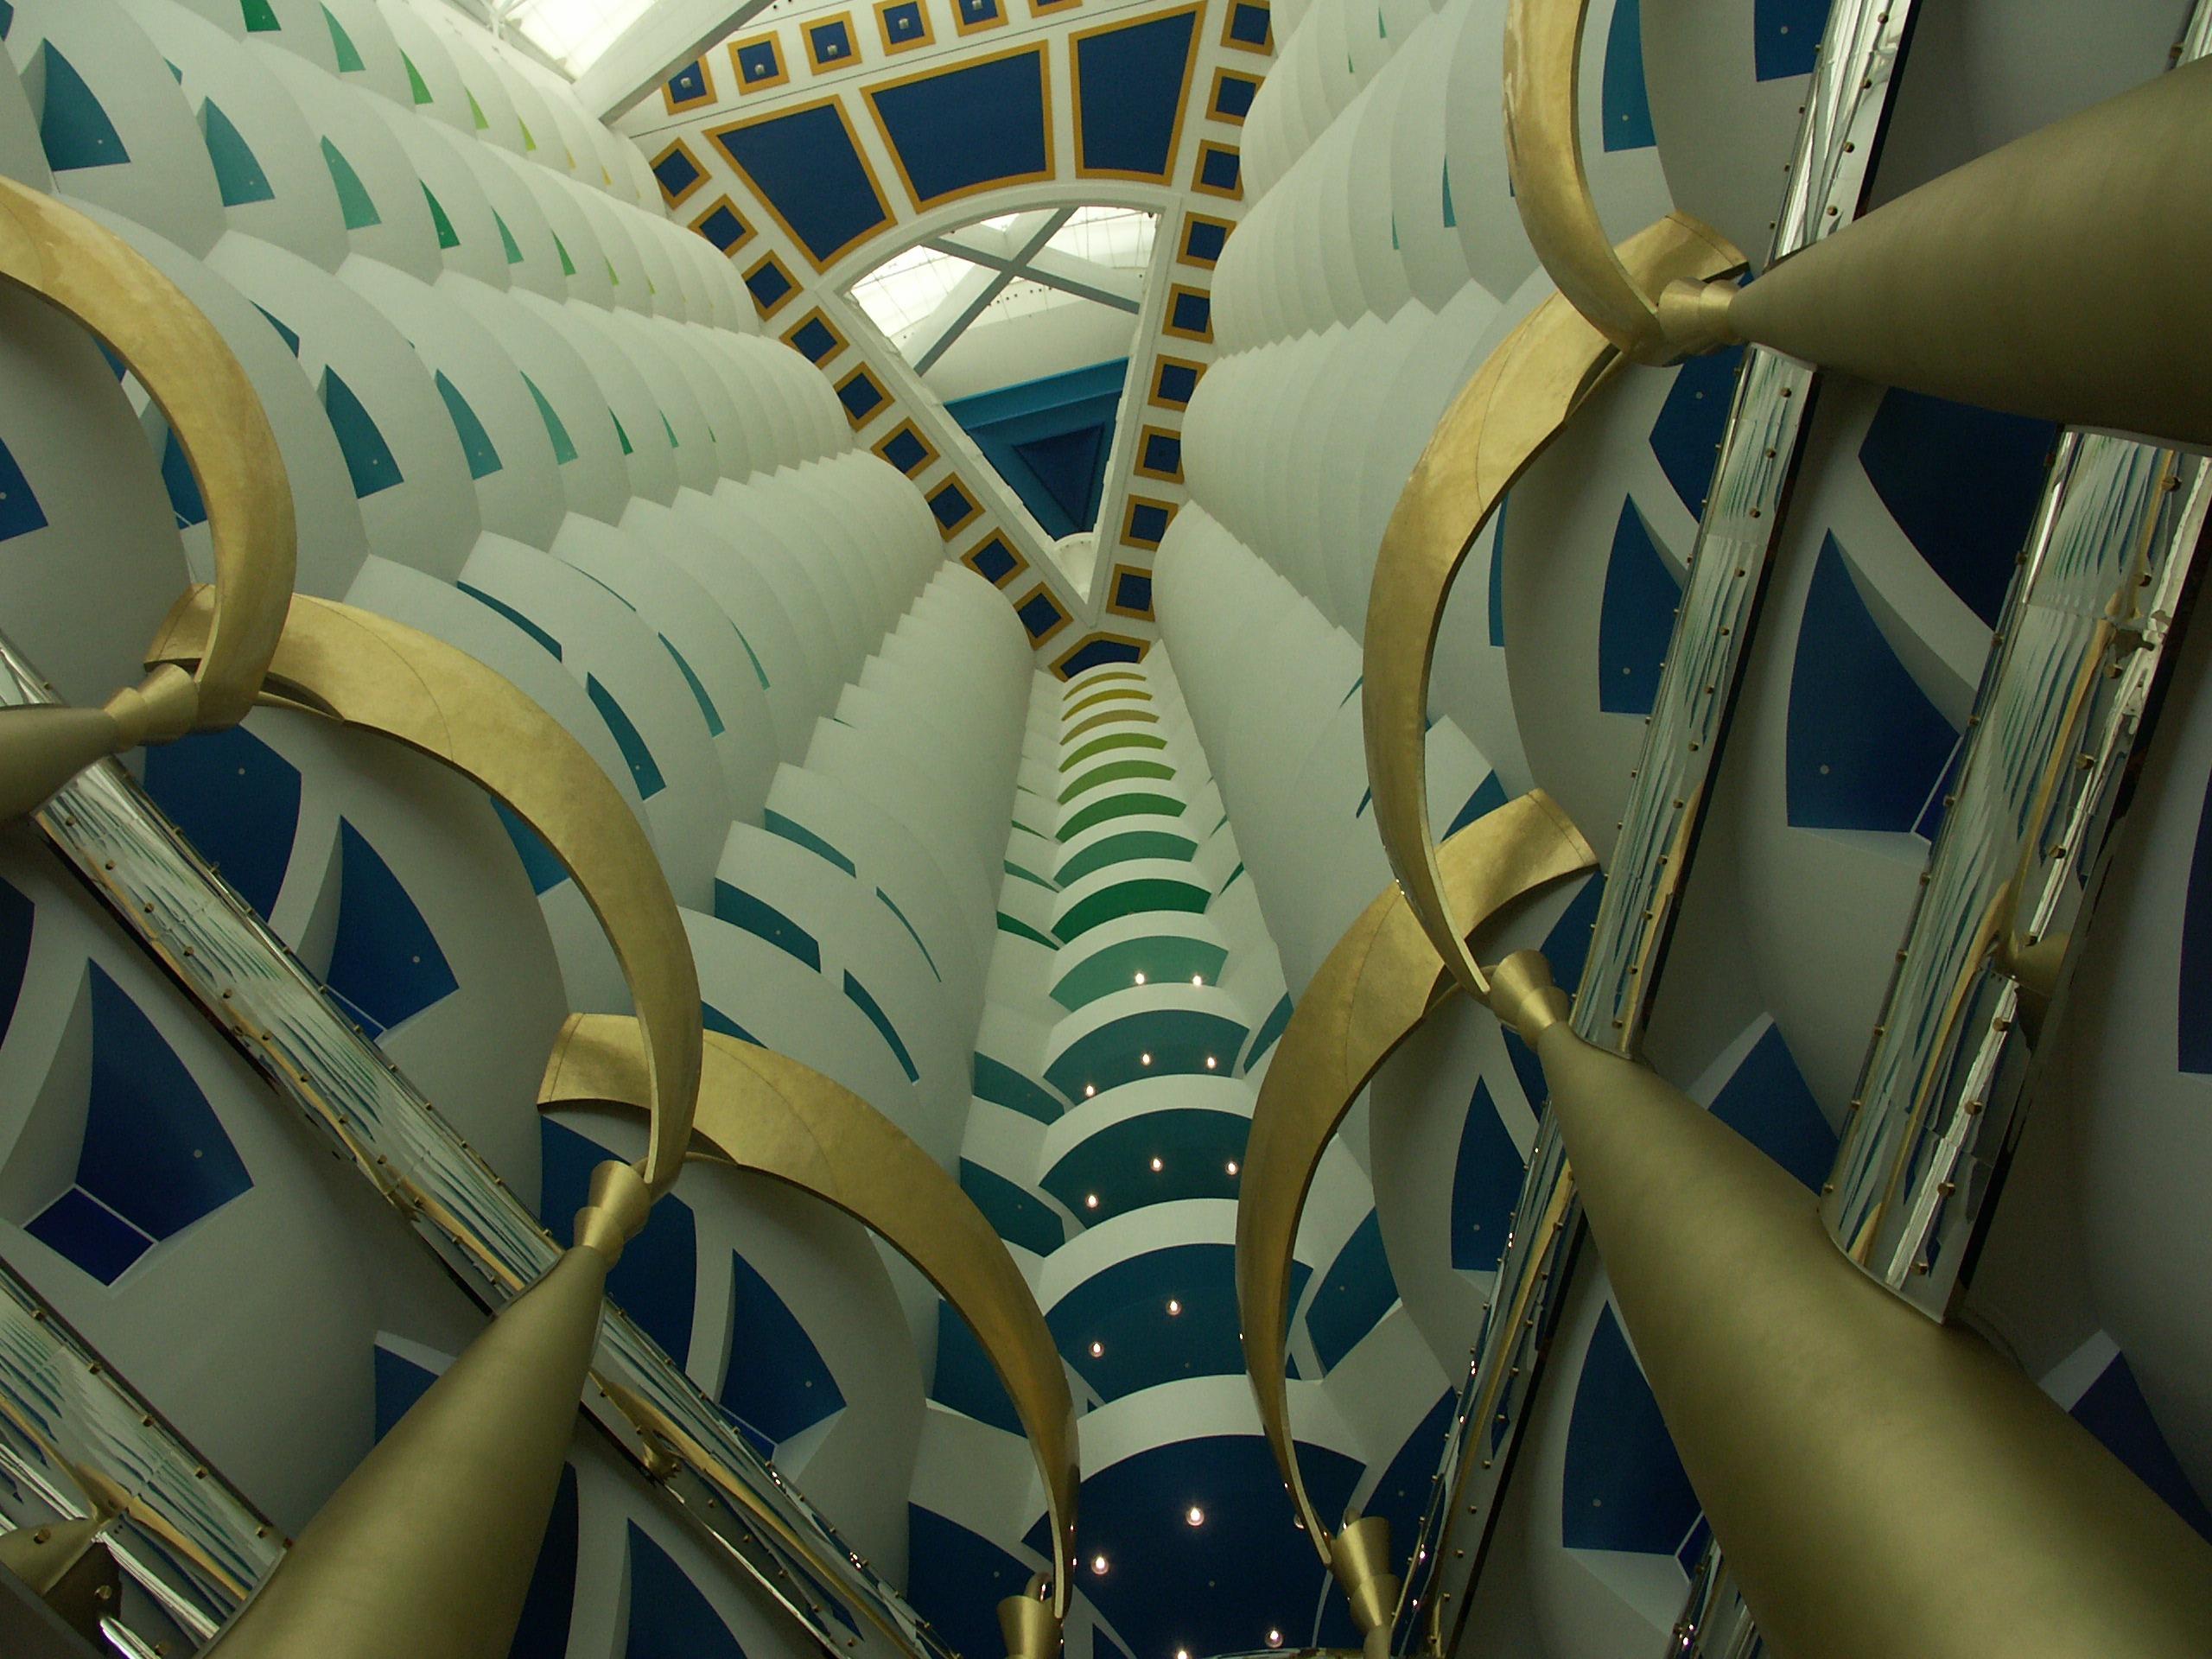 Color art dubai - Architecture Structure Building Skyscraper Color Dubai Blue Structures Art Design Hotel Symmetry Uae Burj Al Arab